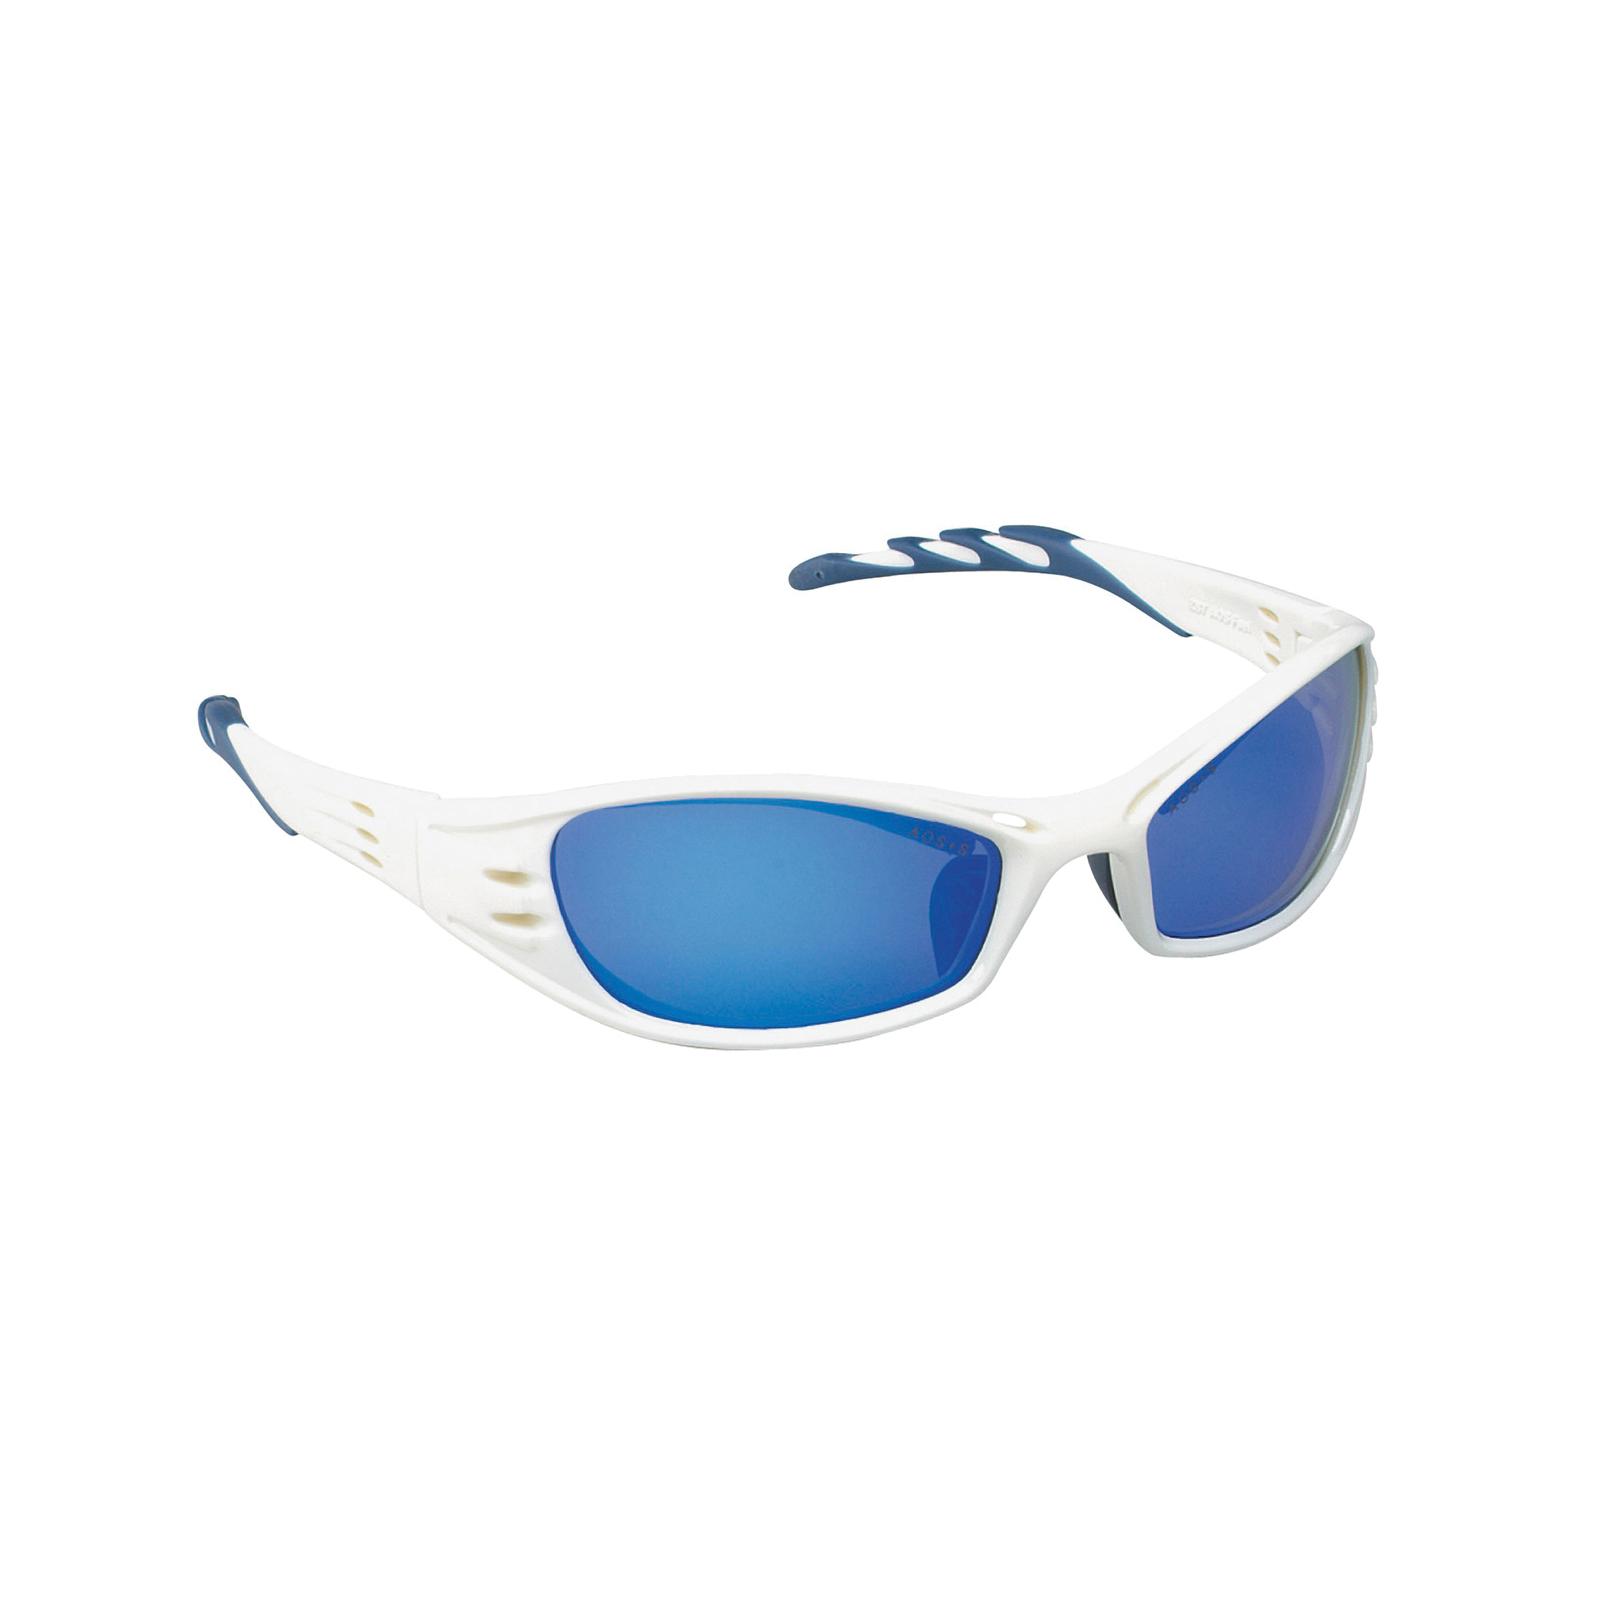 3M™ Fuel™ 078371-62159 Premium Protective Eyewear, Anti-Scratch, Blue Mirror Lens, Full Framed Frame, Glacier White, Plastic Frame, Polycarbonate Lens, ANSI Z87.1-2015